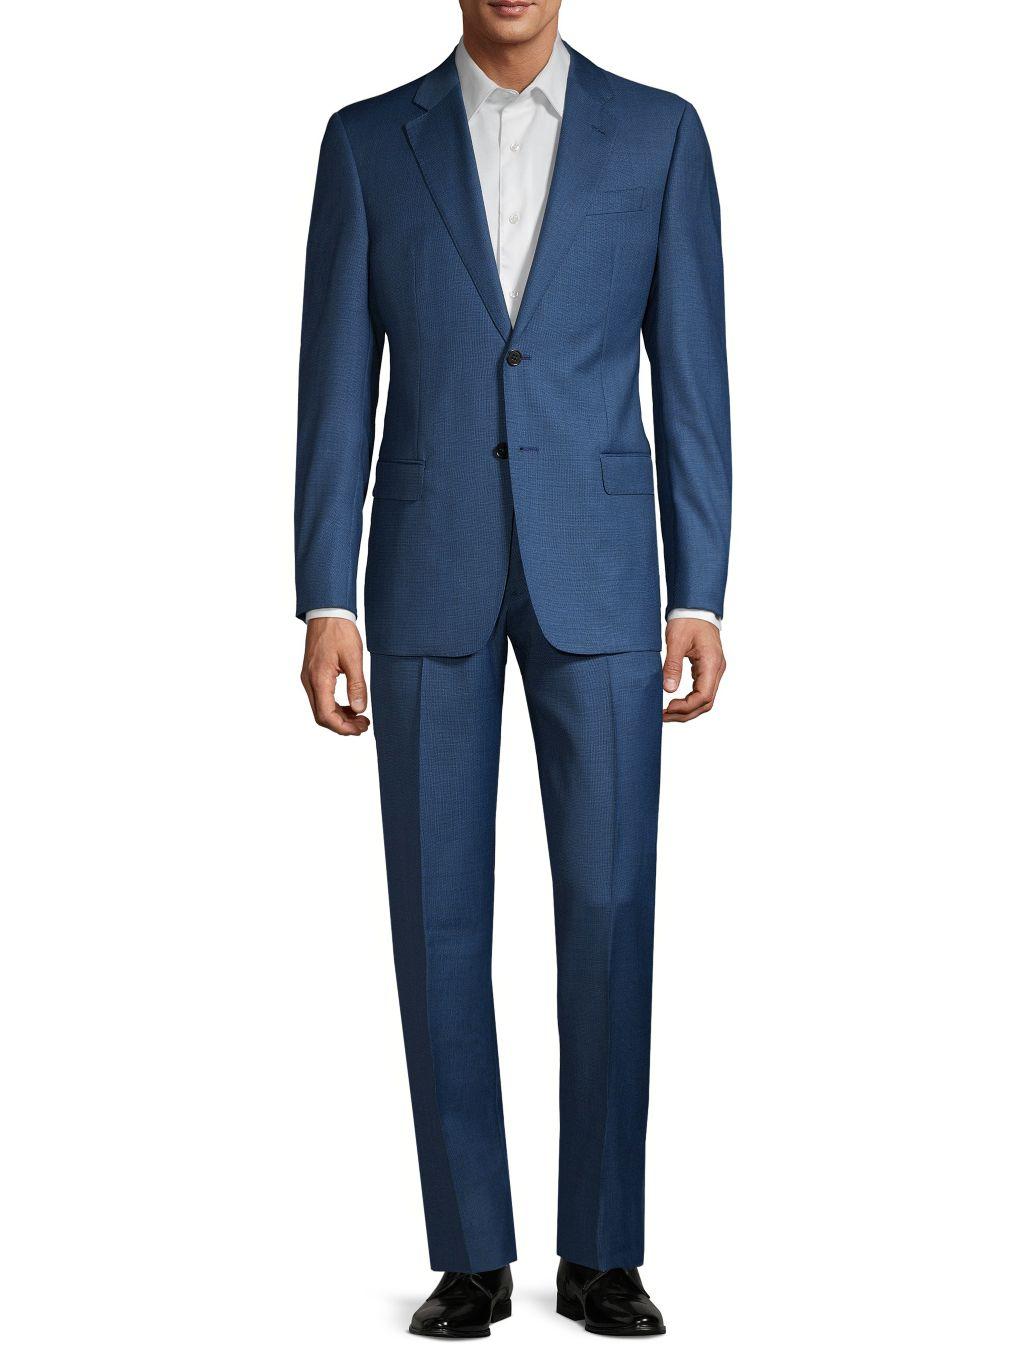 Emporio Armani G-Line Fit Pindot Virgin-Wool Suit